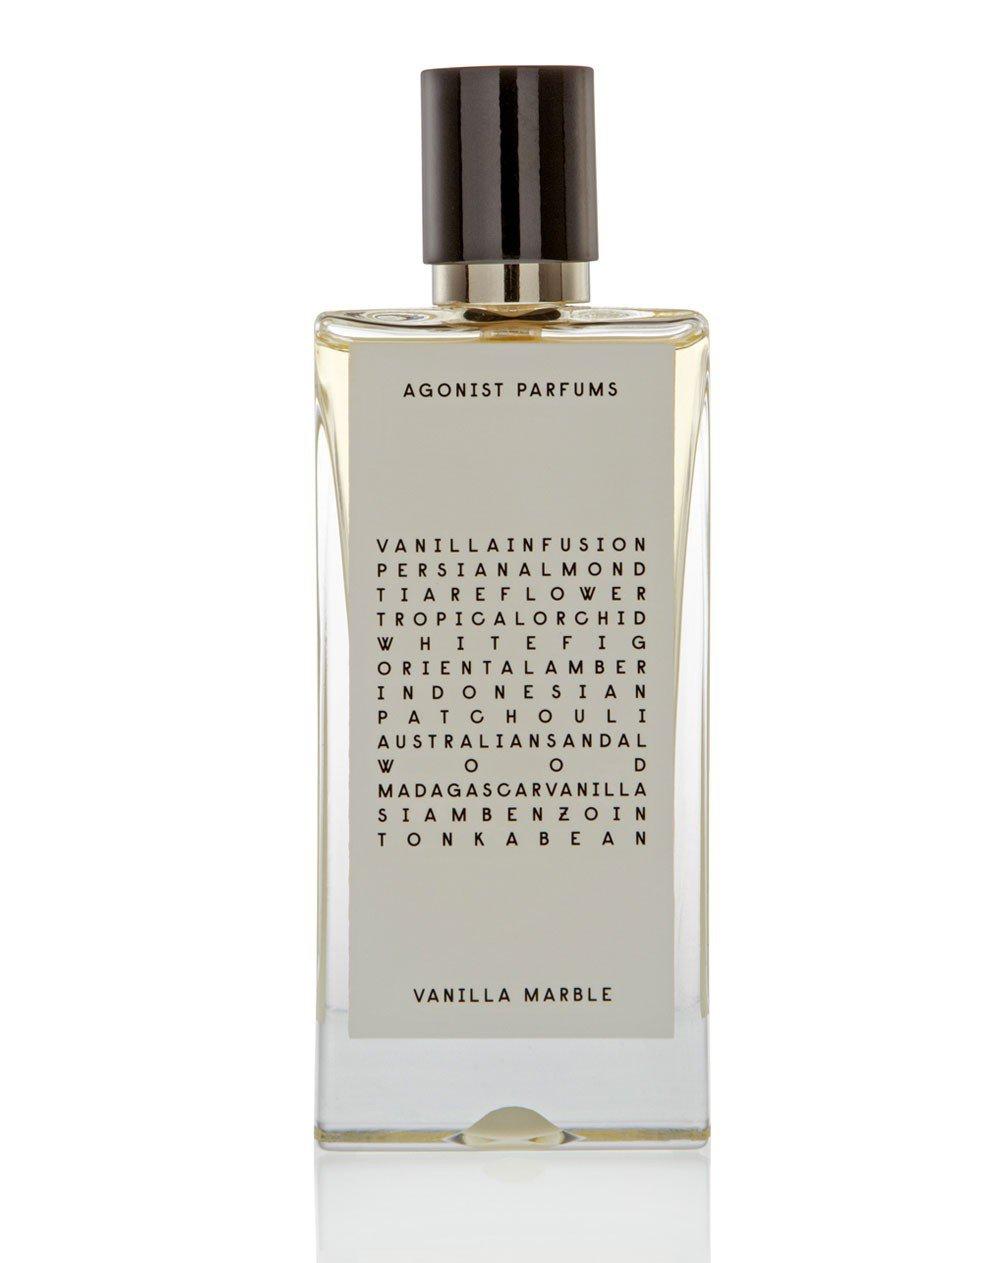 Agonist Vanilla Marble парфюмированная вода 50мл refill (Agonist Vanilla Marble | «Агонист Мраморная Ваниль»)